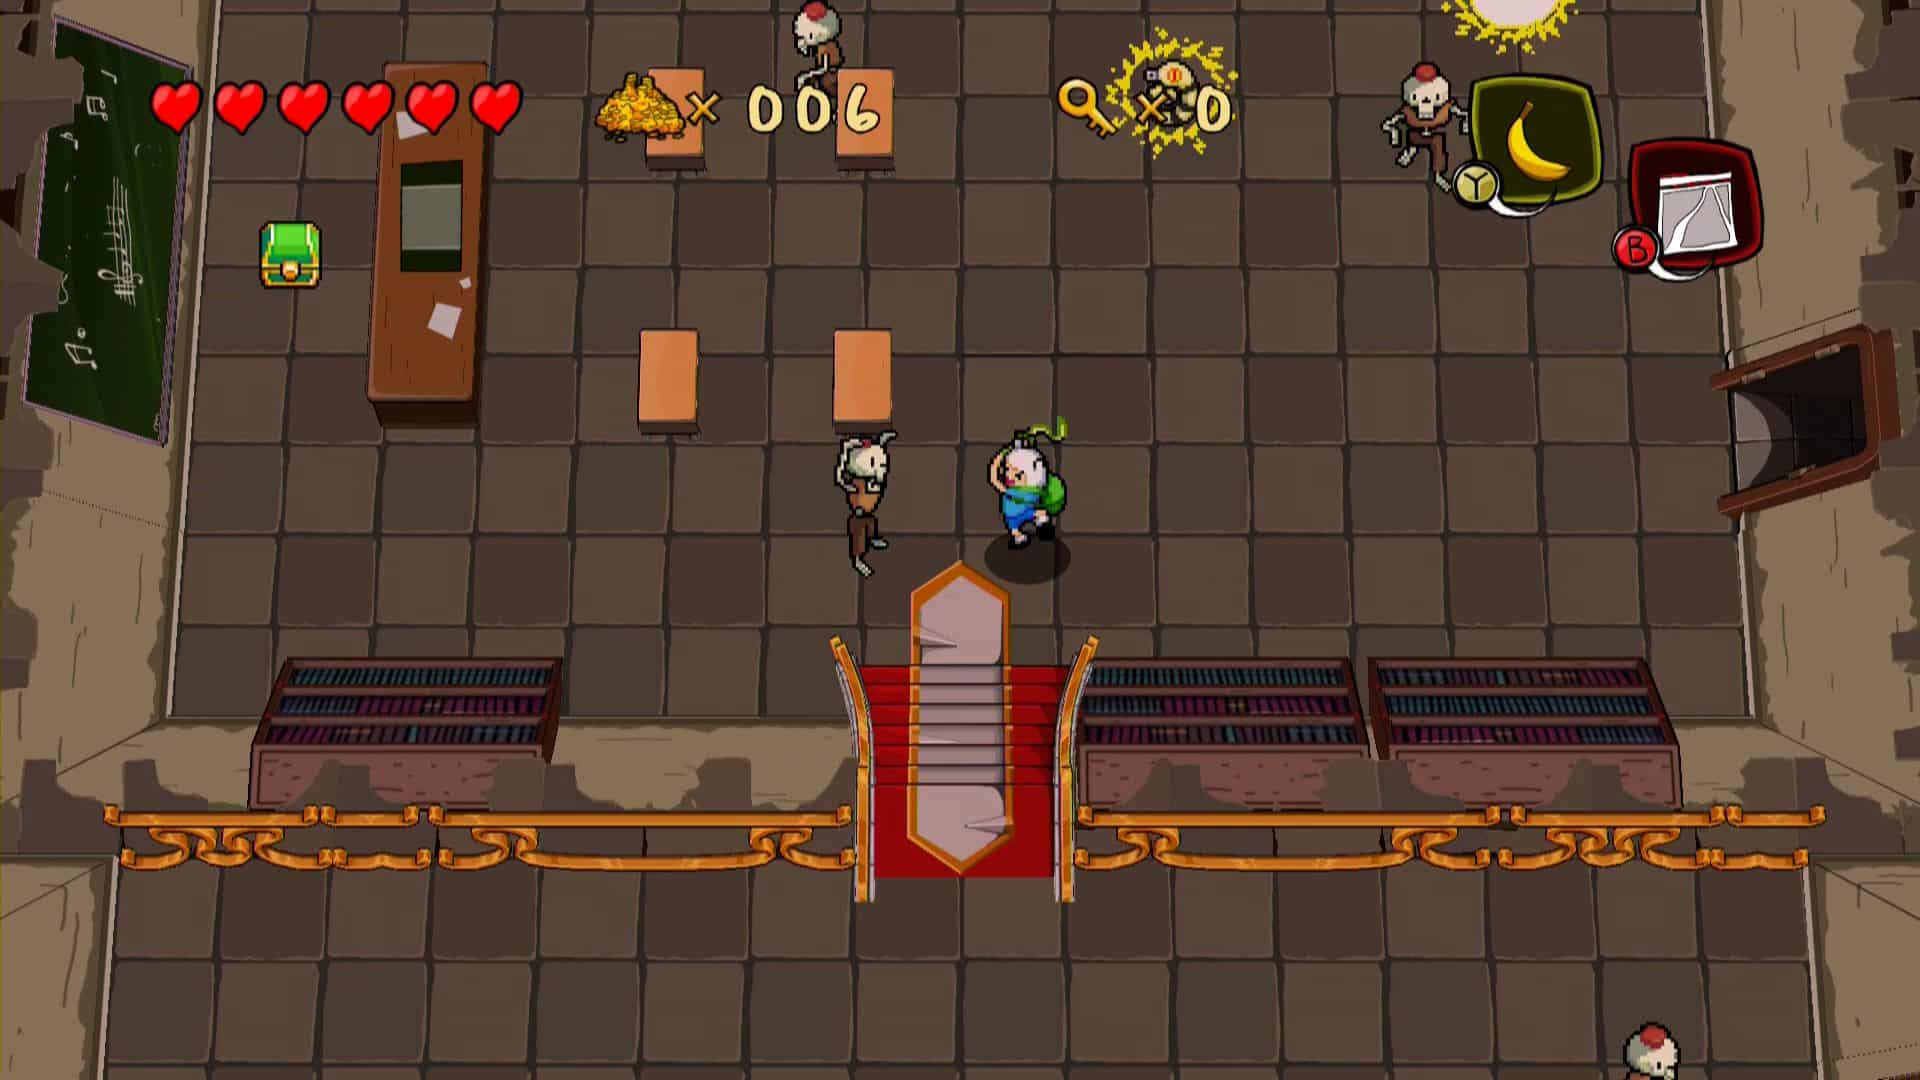 adventure-time-secret-nameless-kingdom-screenshot-4